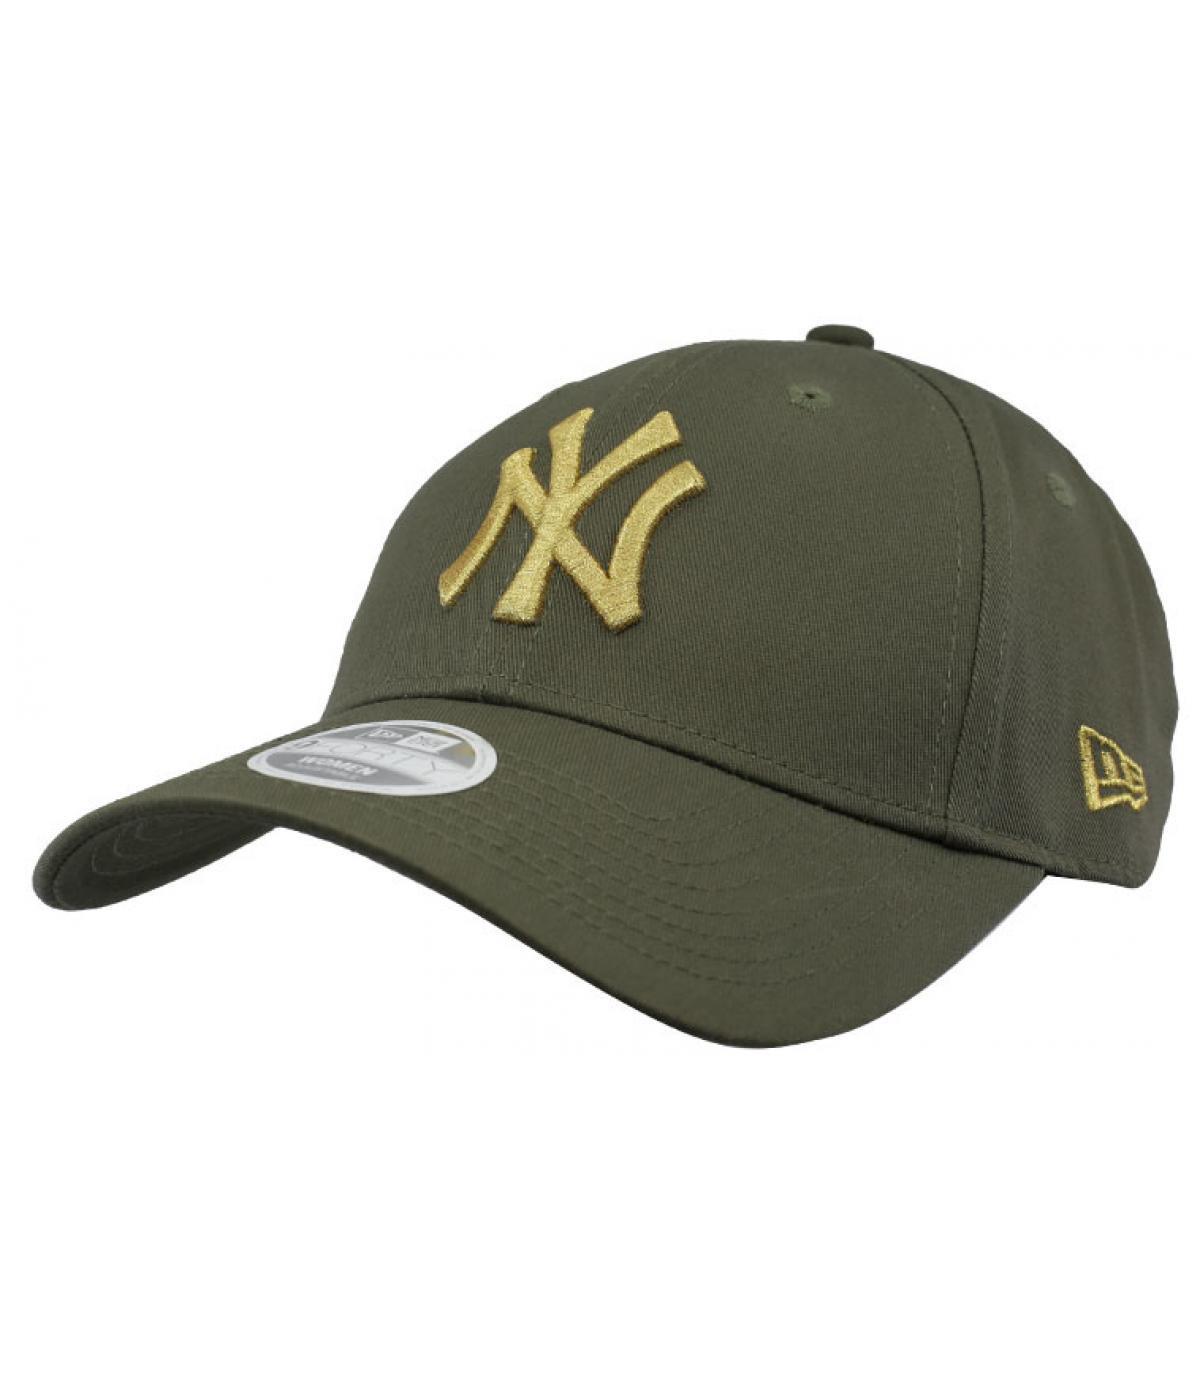 casquette NY enfant vert or